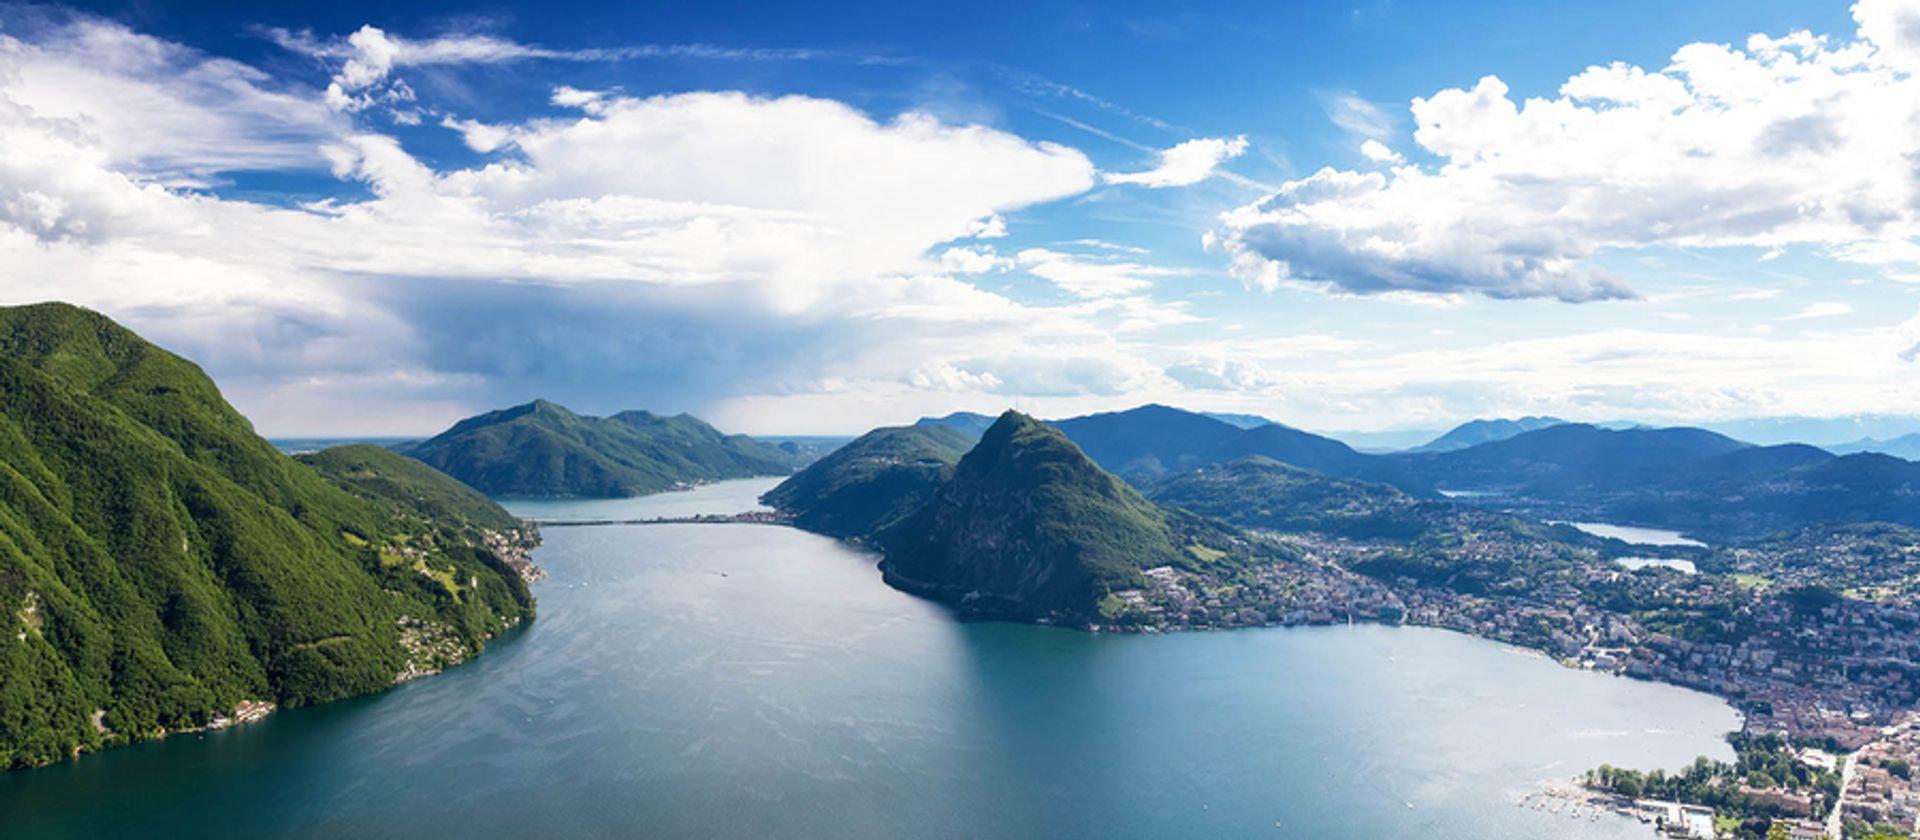 La Svizzera italiana